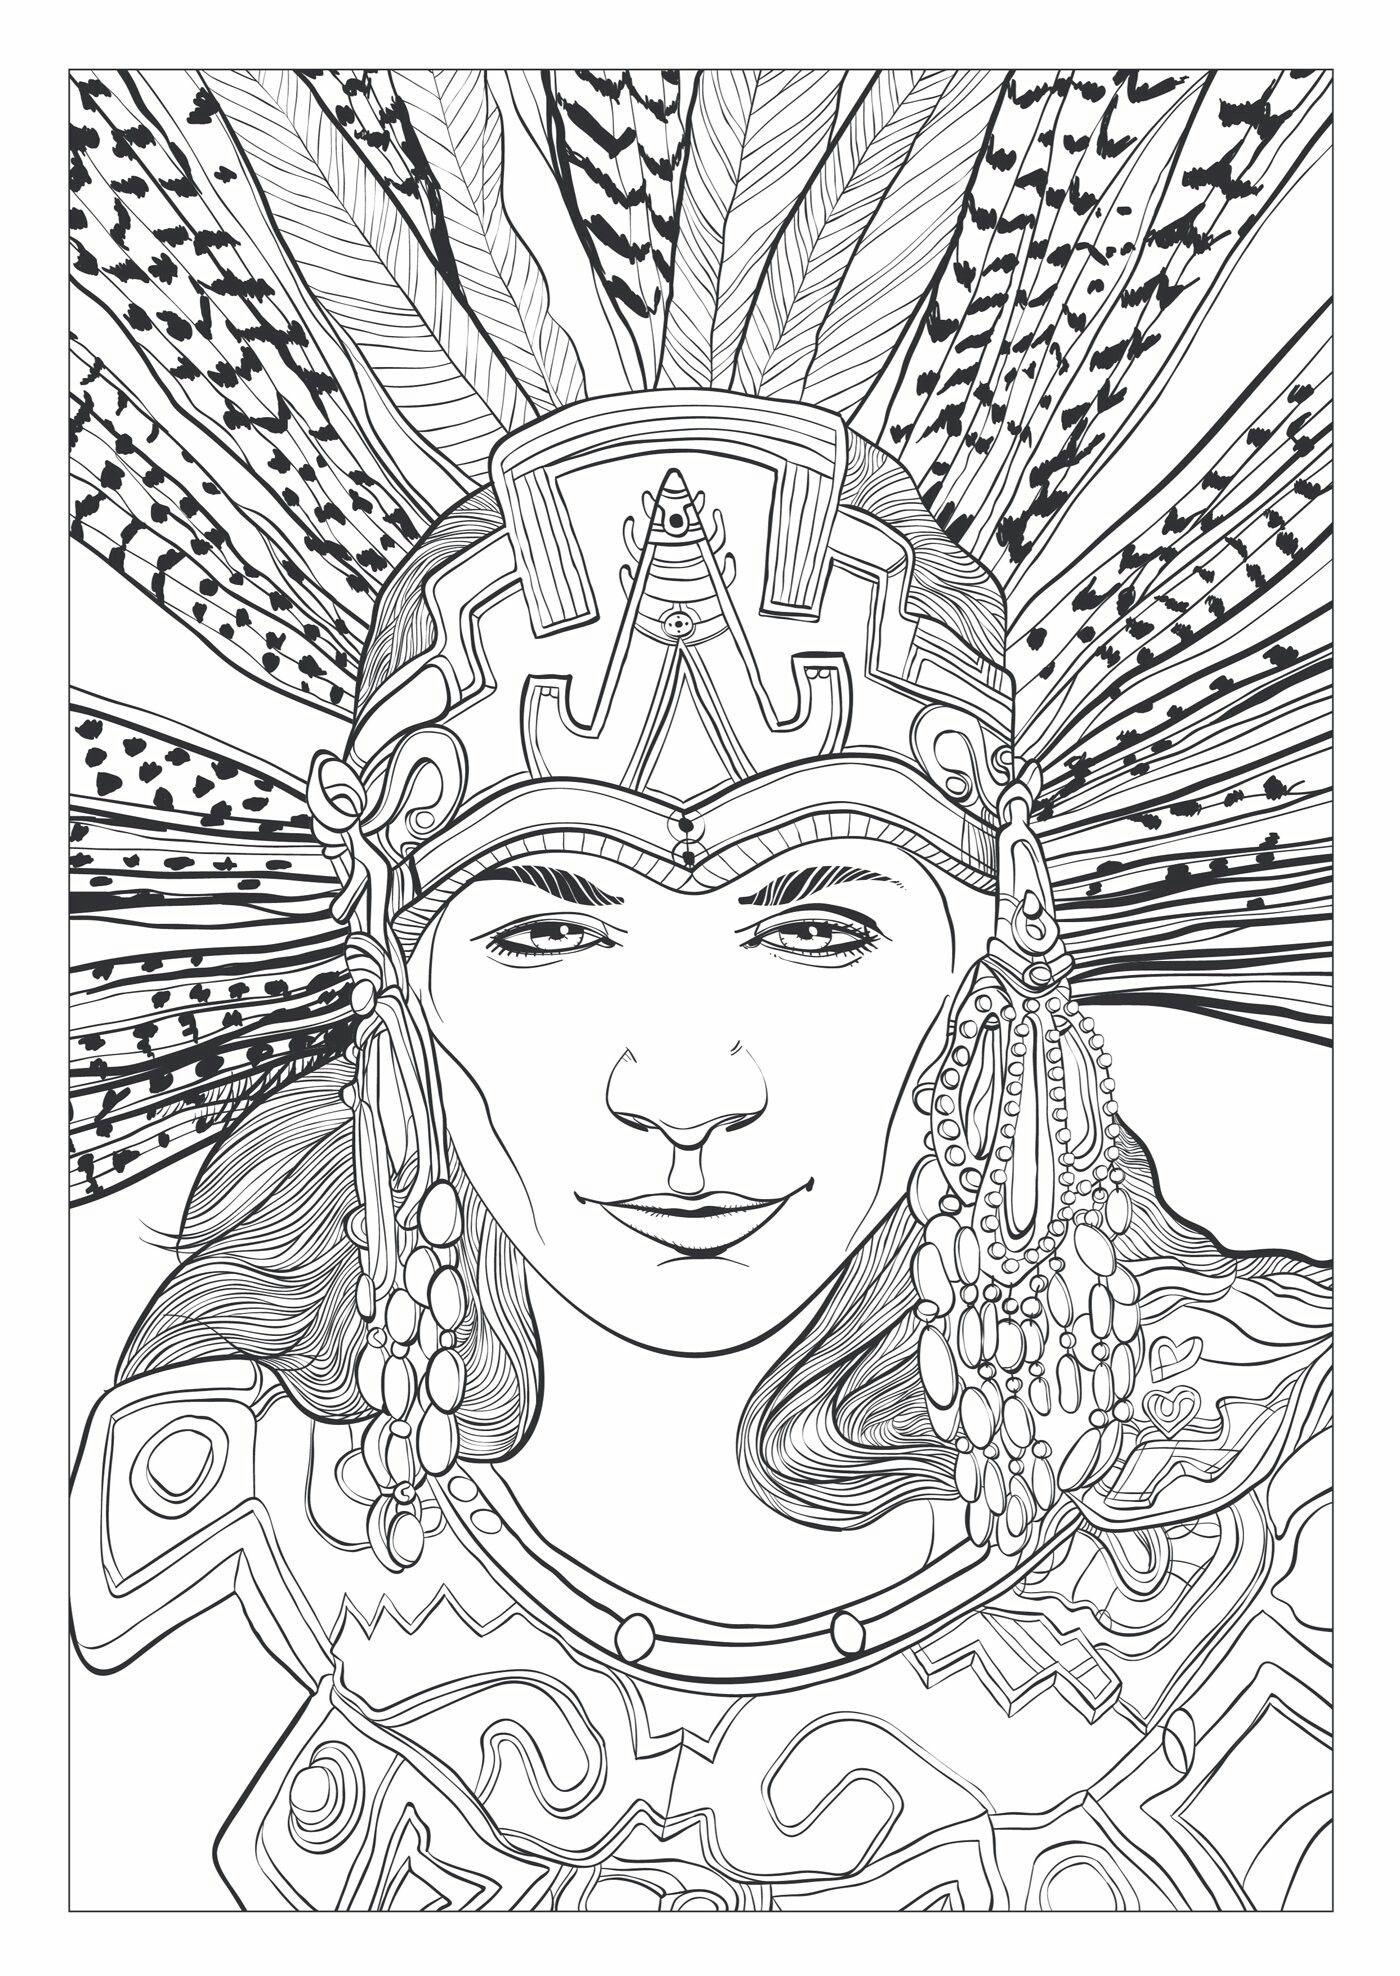 Pin de Isabel Riveros en Mandalas | Pinterest | Mandalas